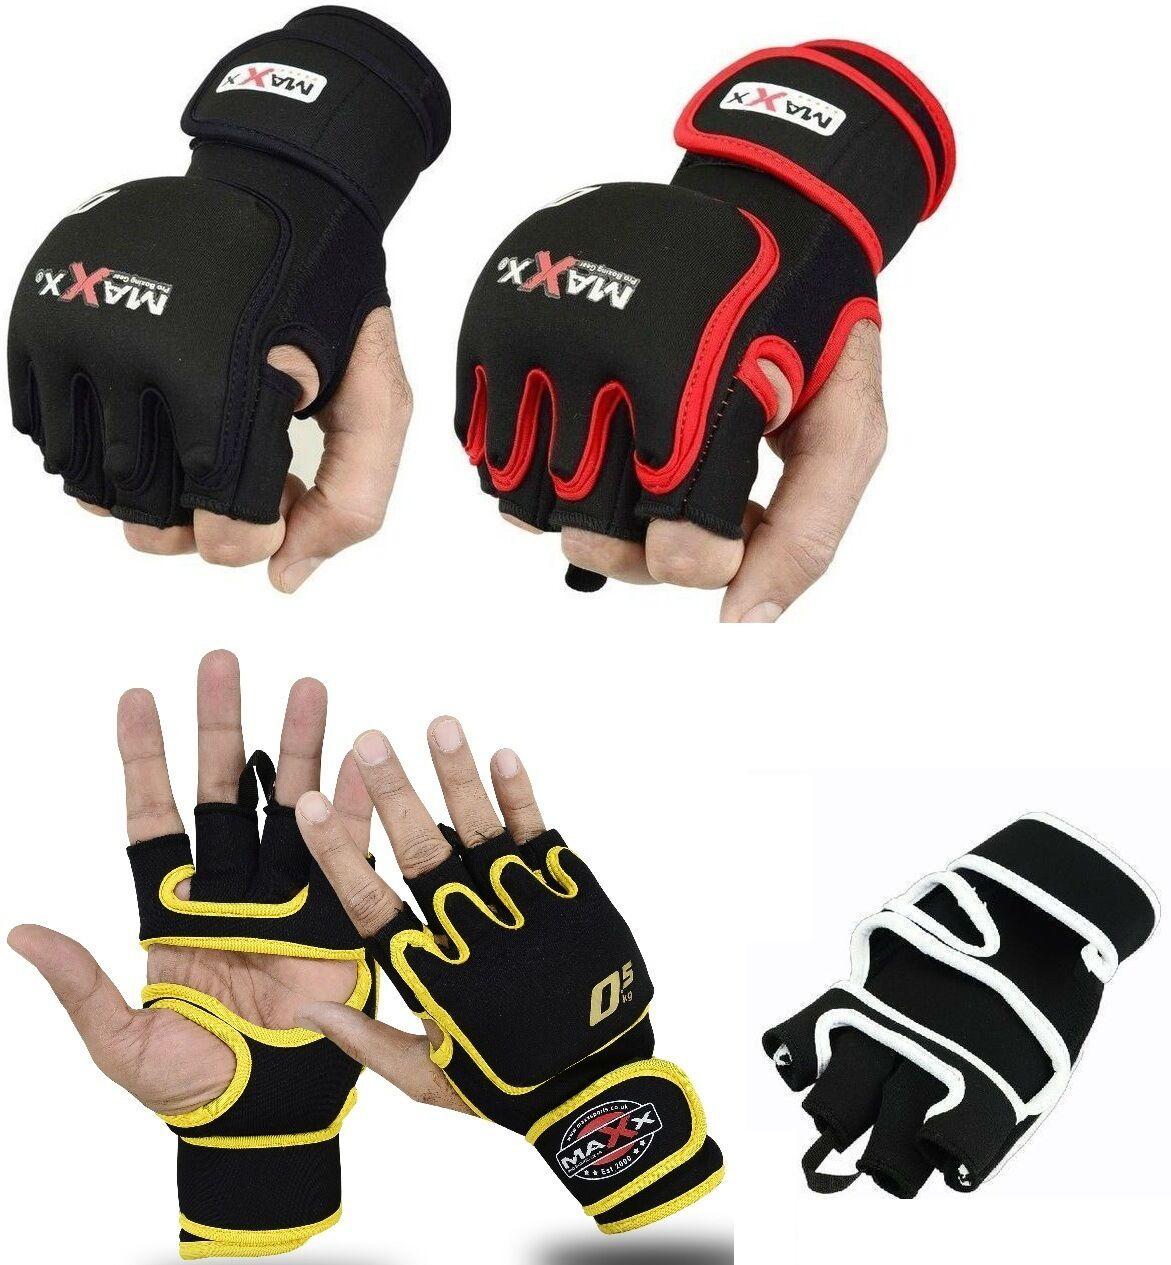 New Pair Neoprene Hand Wrap Wrist Weight Grip Gloves 0 5